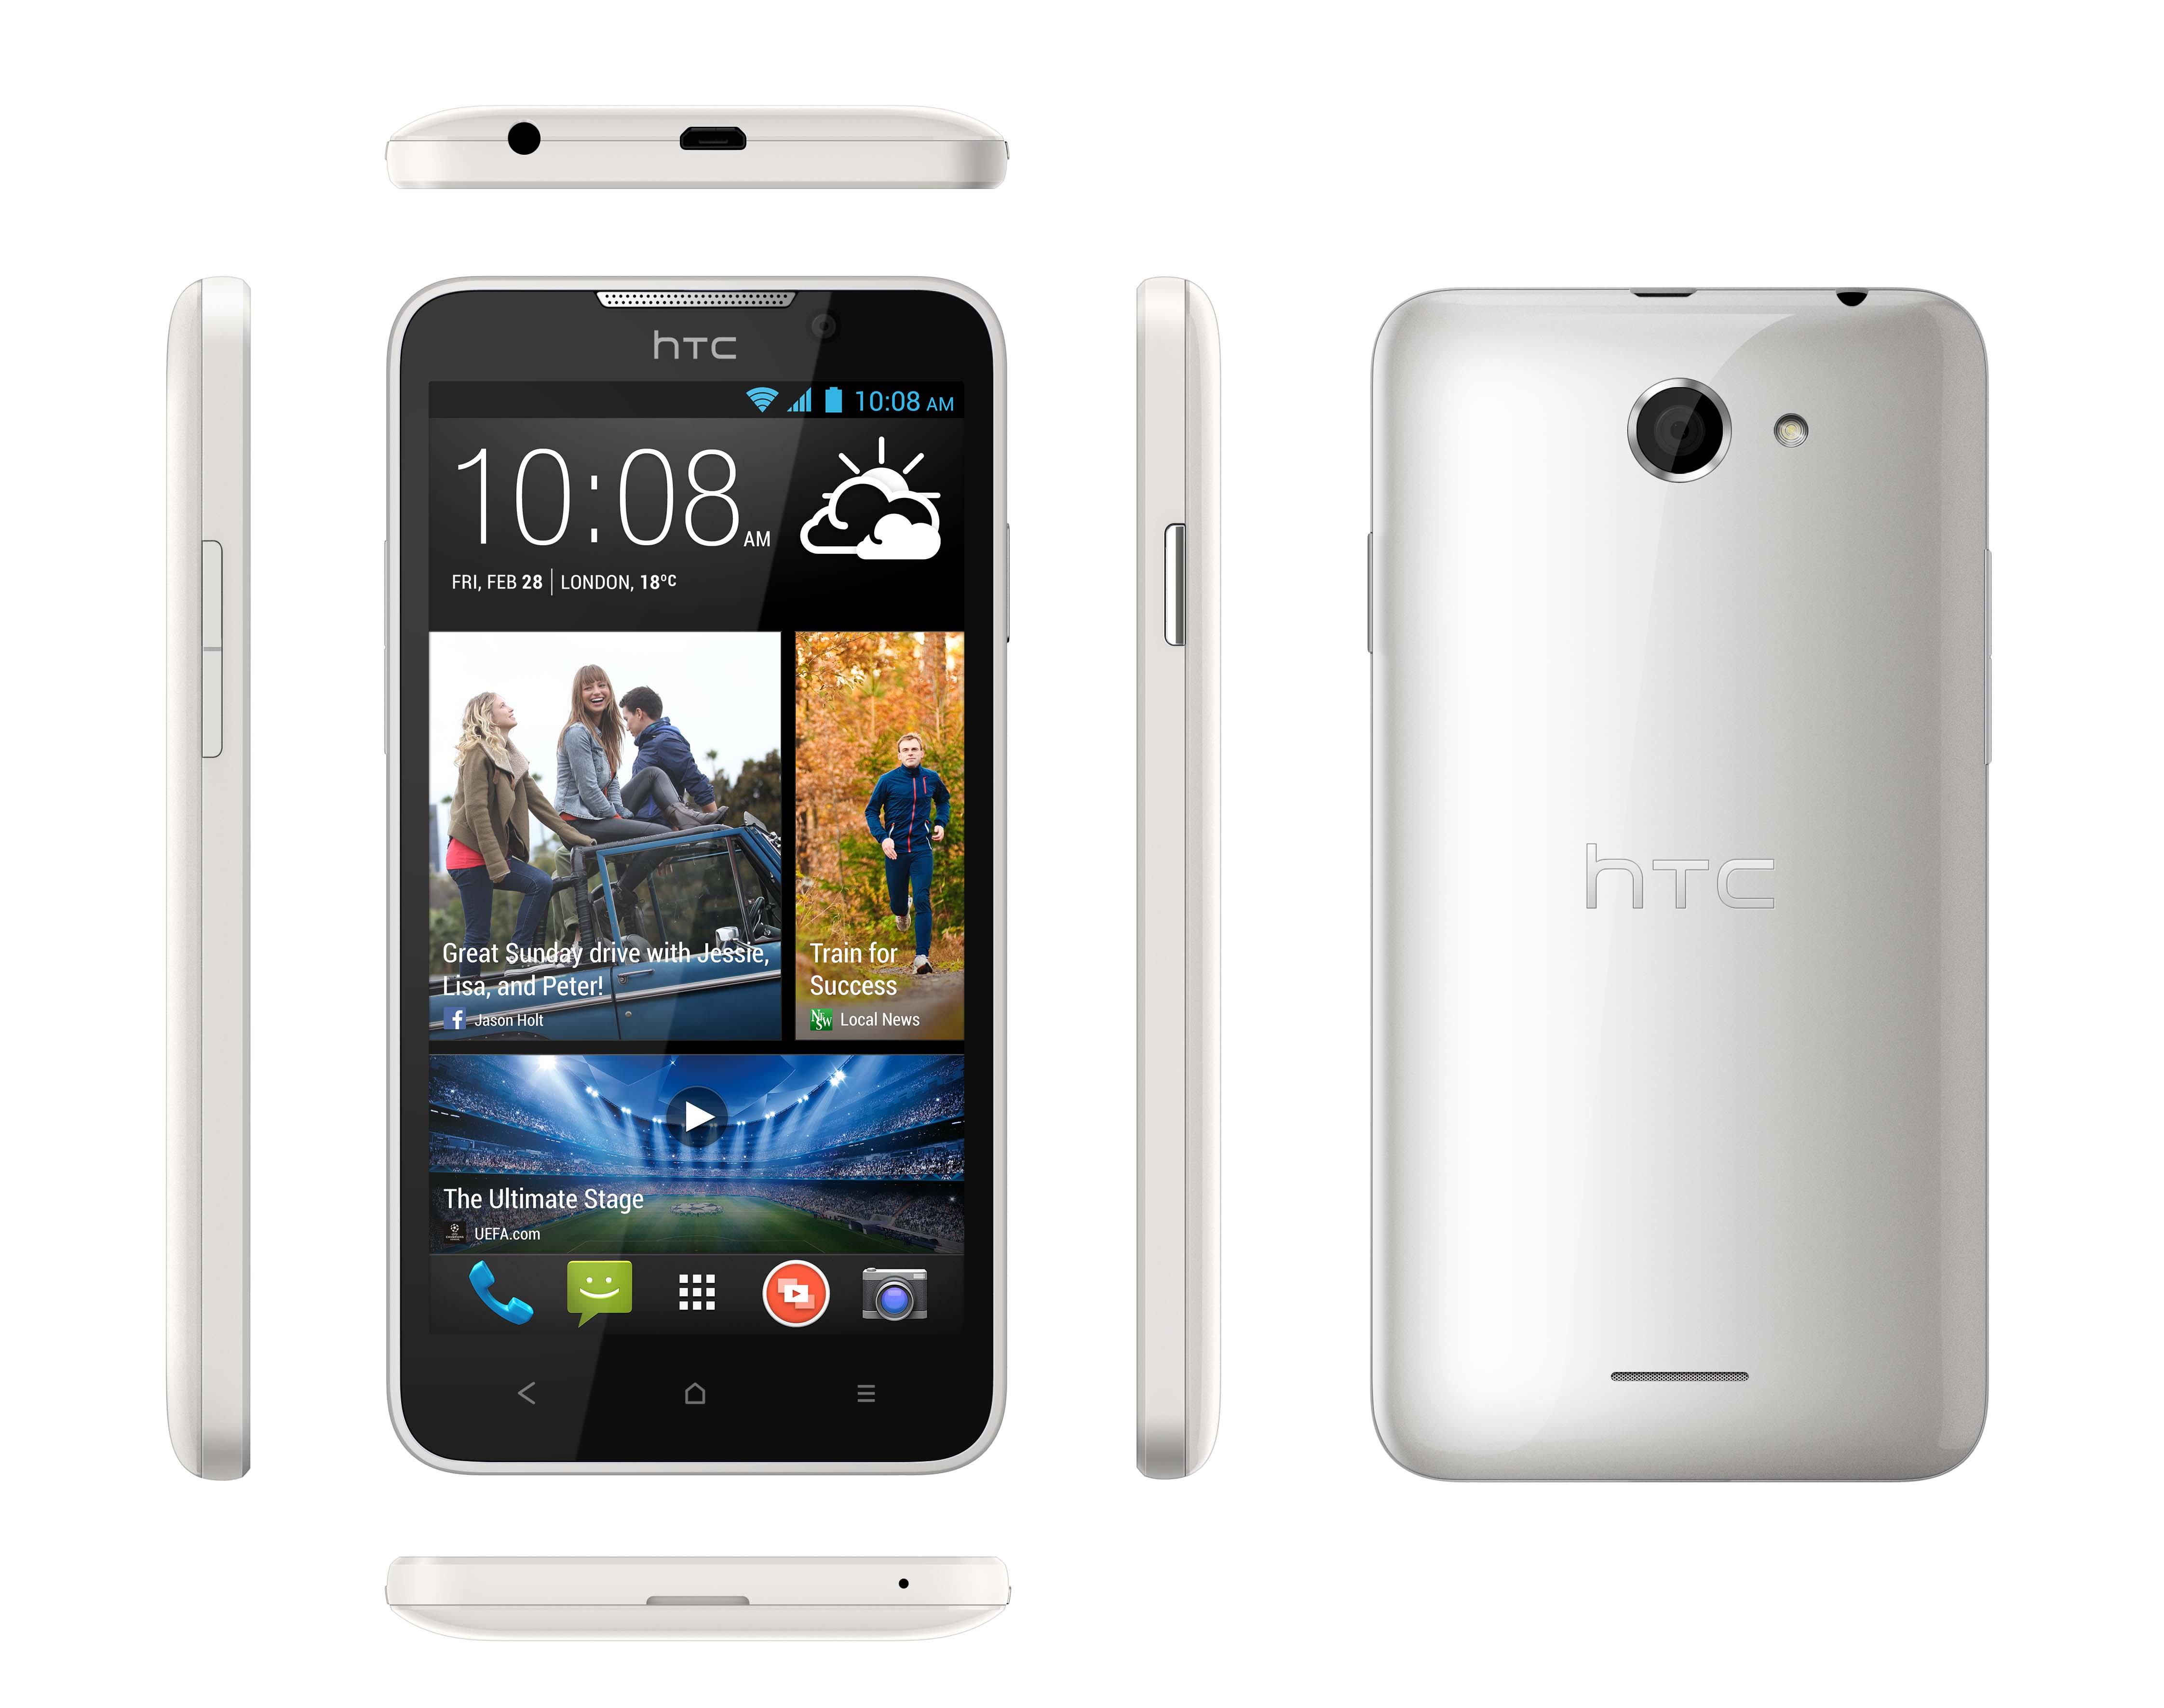 HTC-Desire-516-dual-SIM-2.jpg